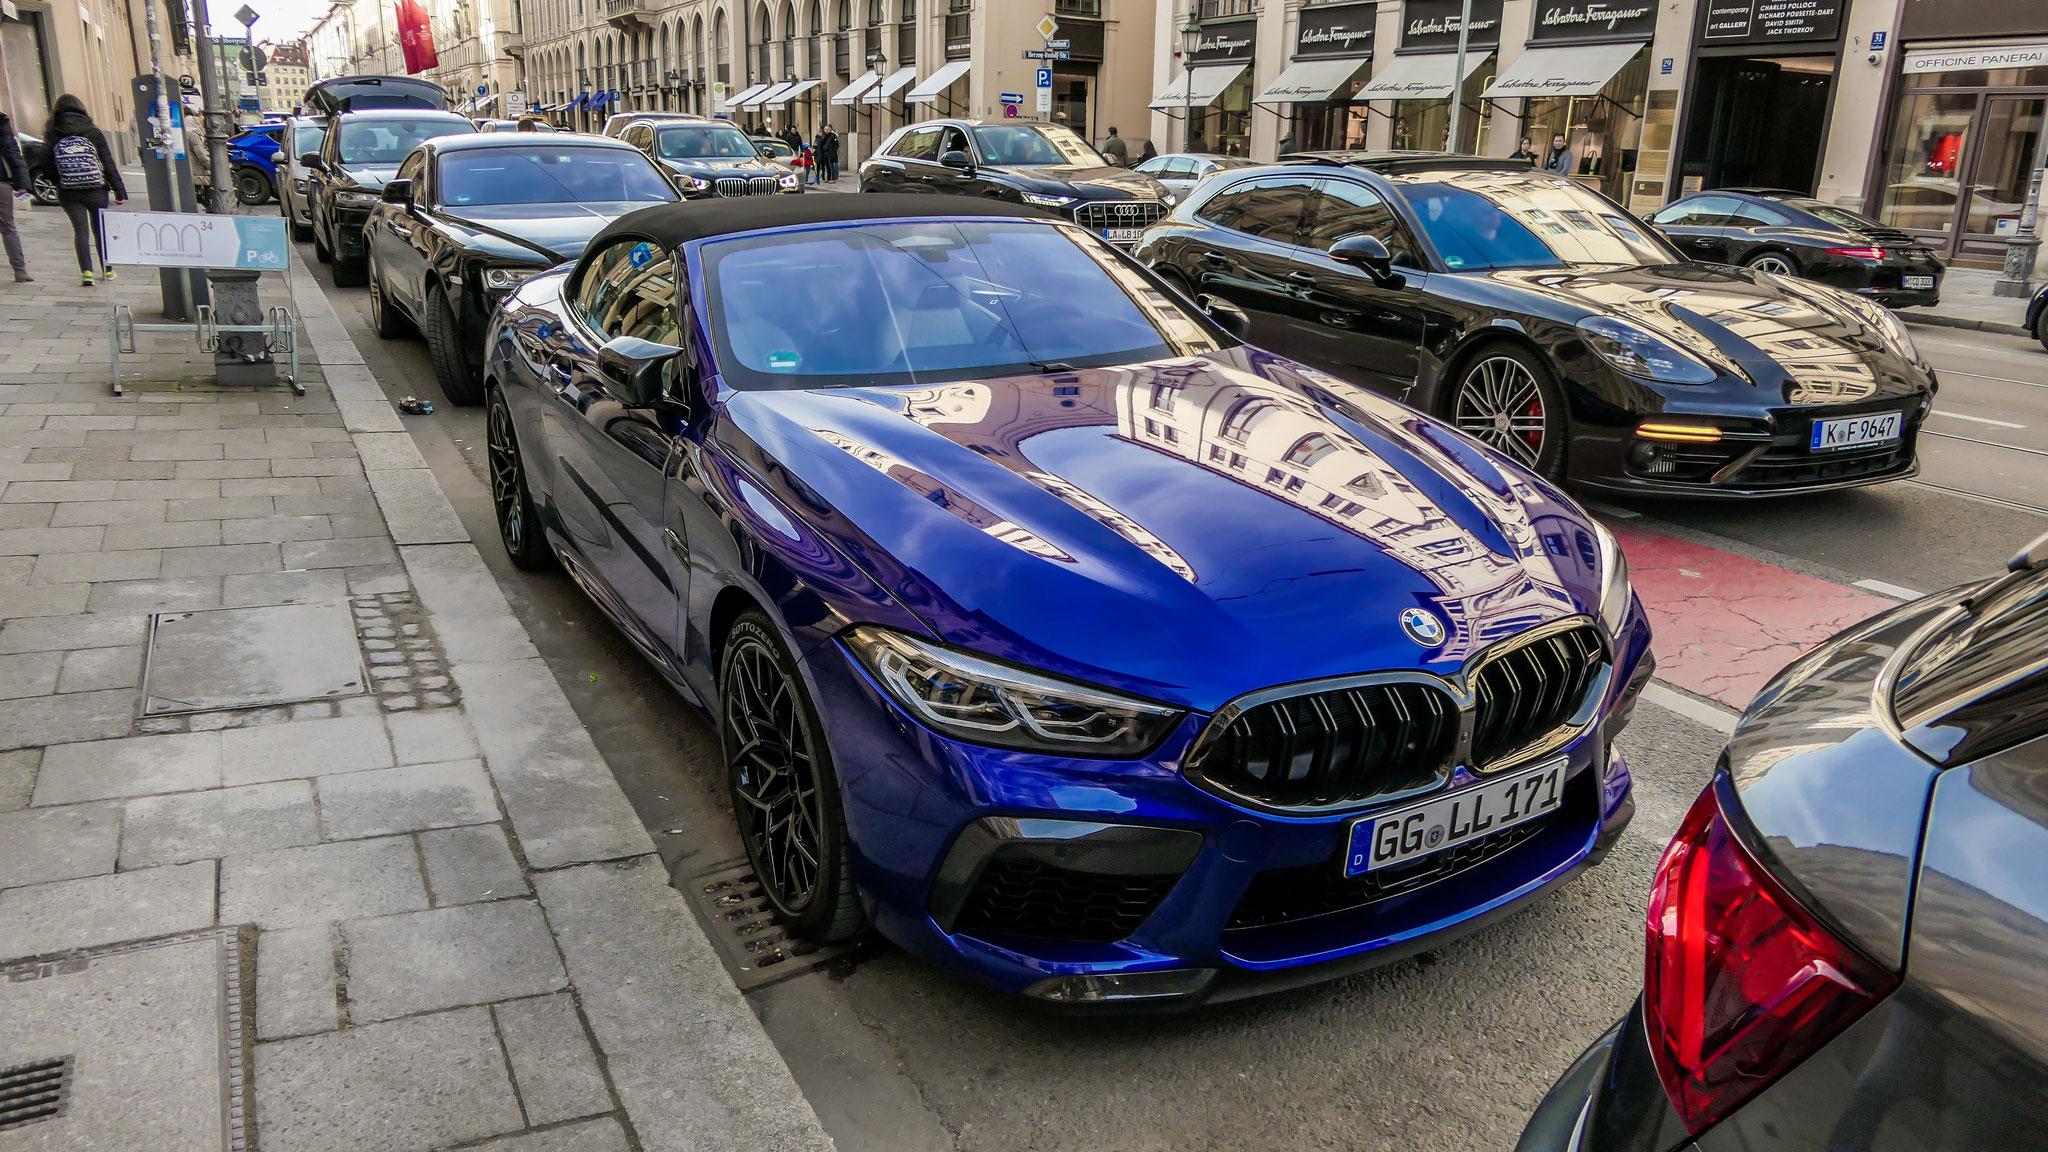 BMW M8 Competition Cabrio - GG-LL-171